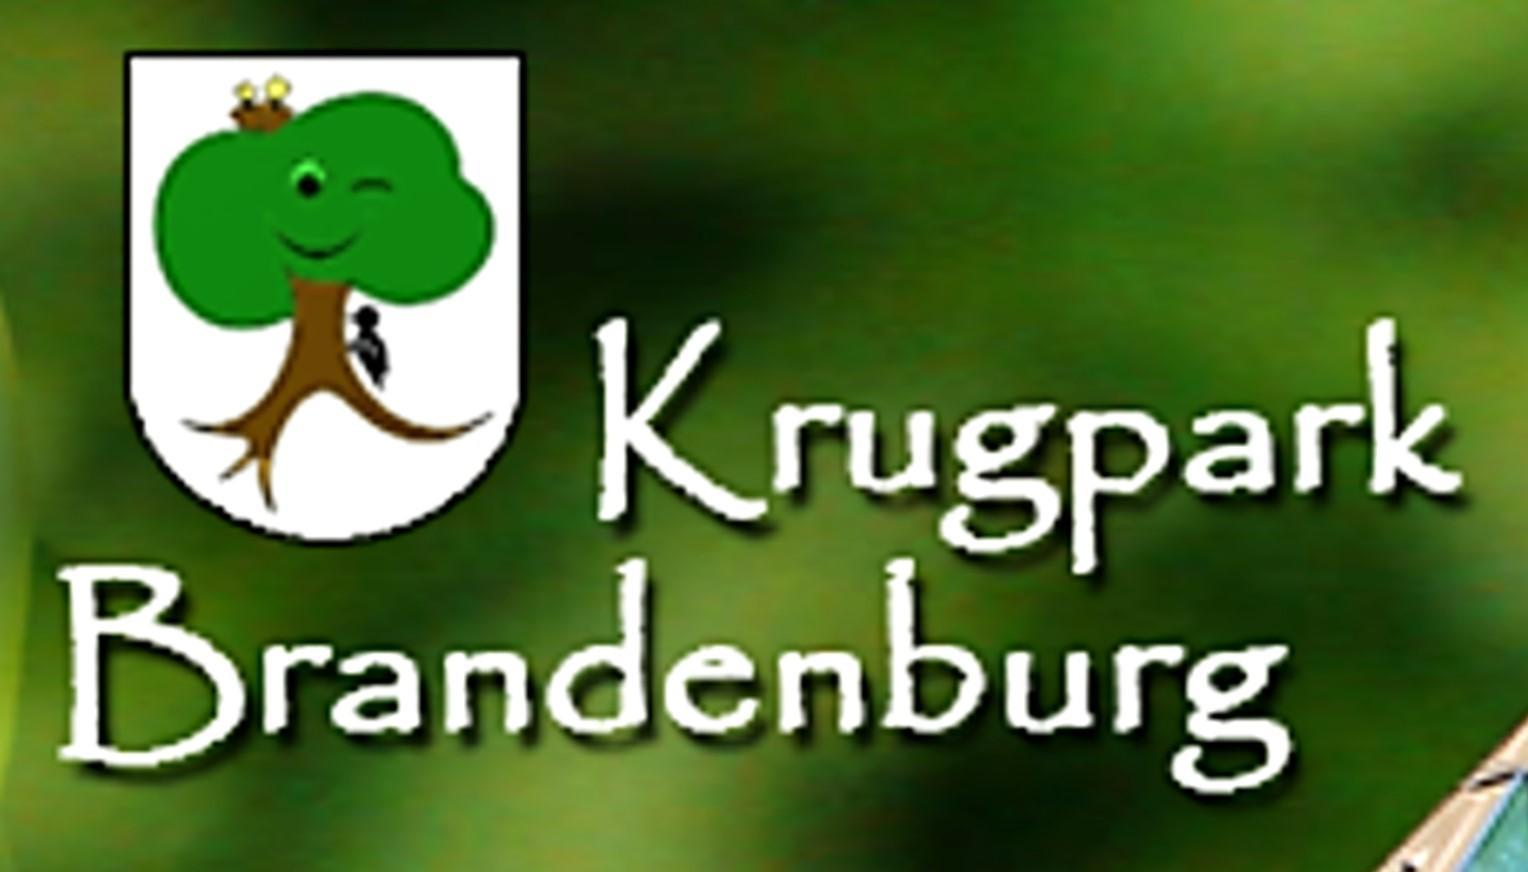 Krugpark Brandenburg